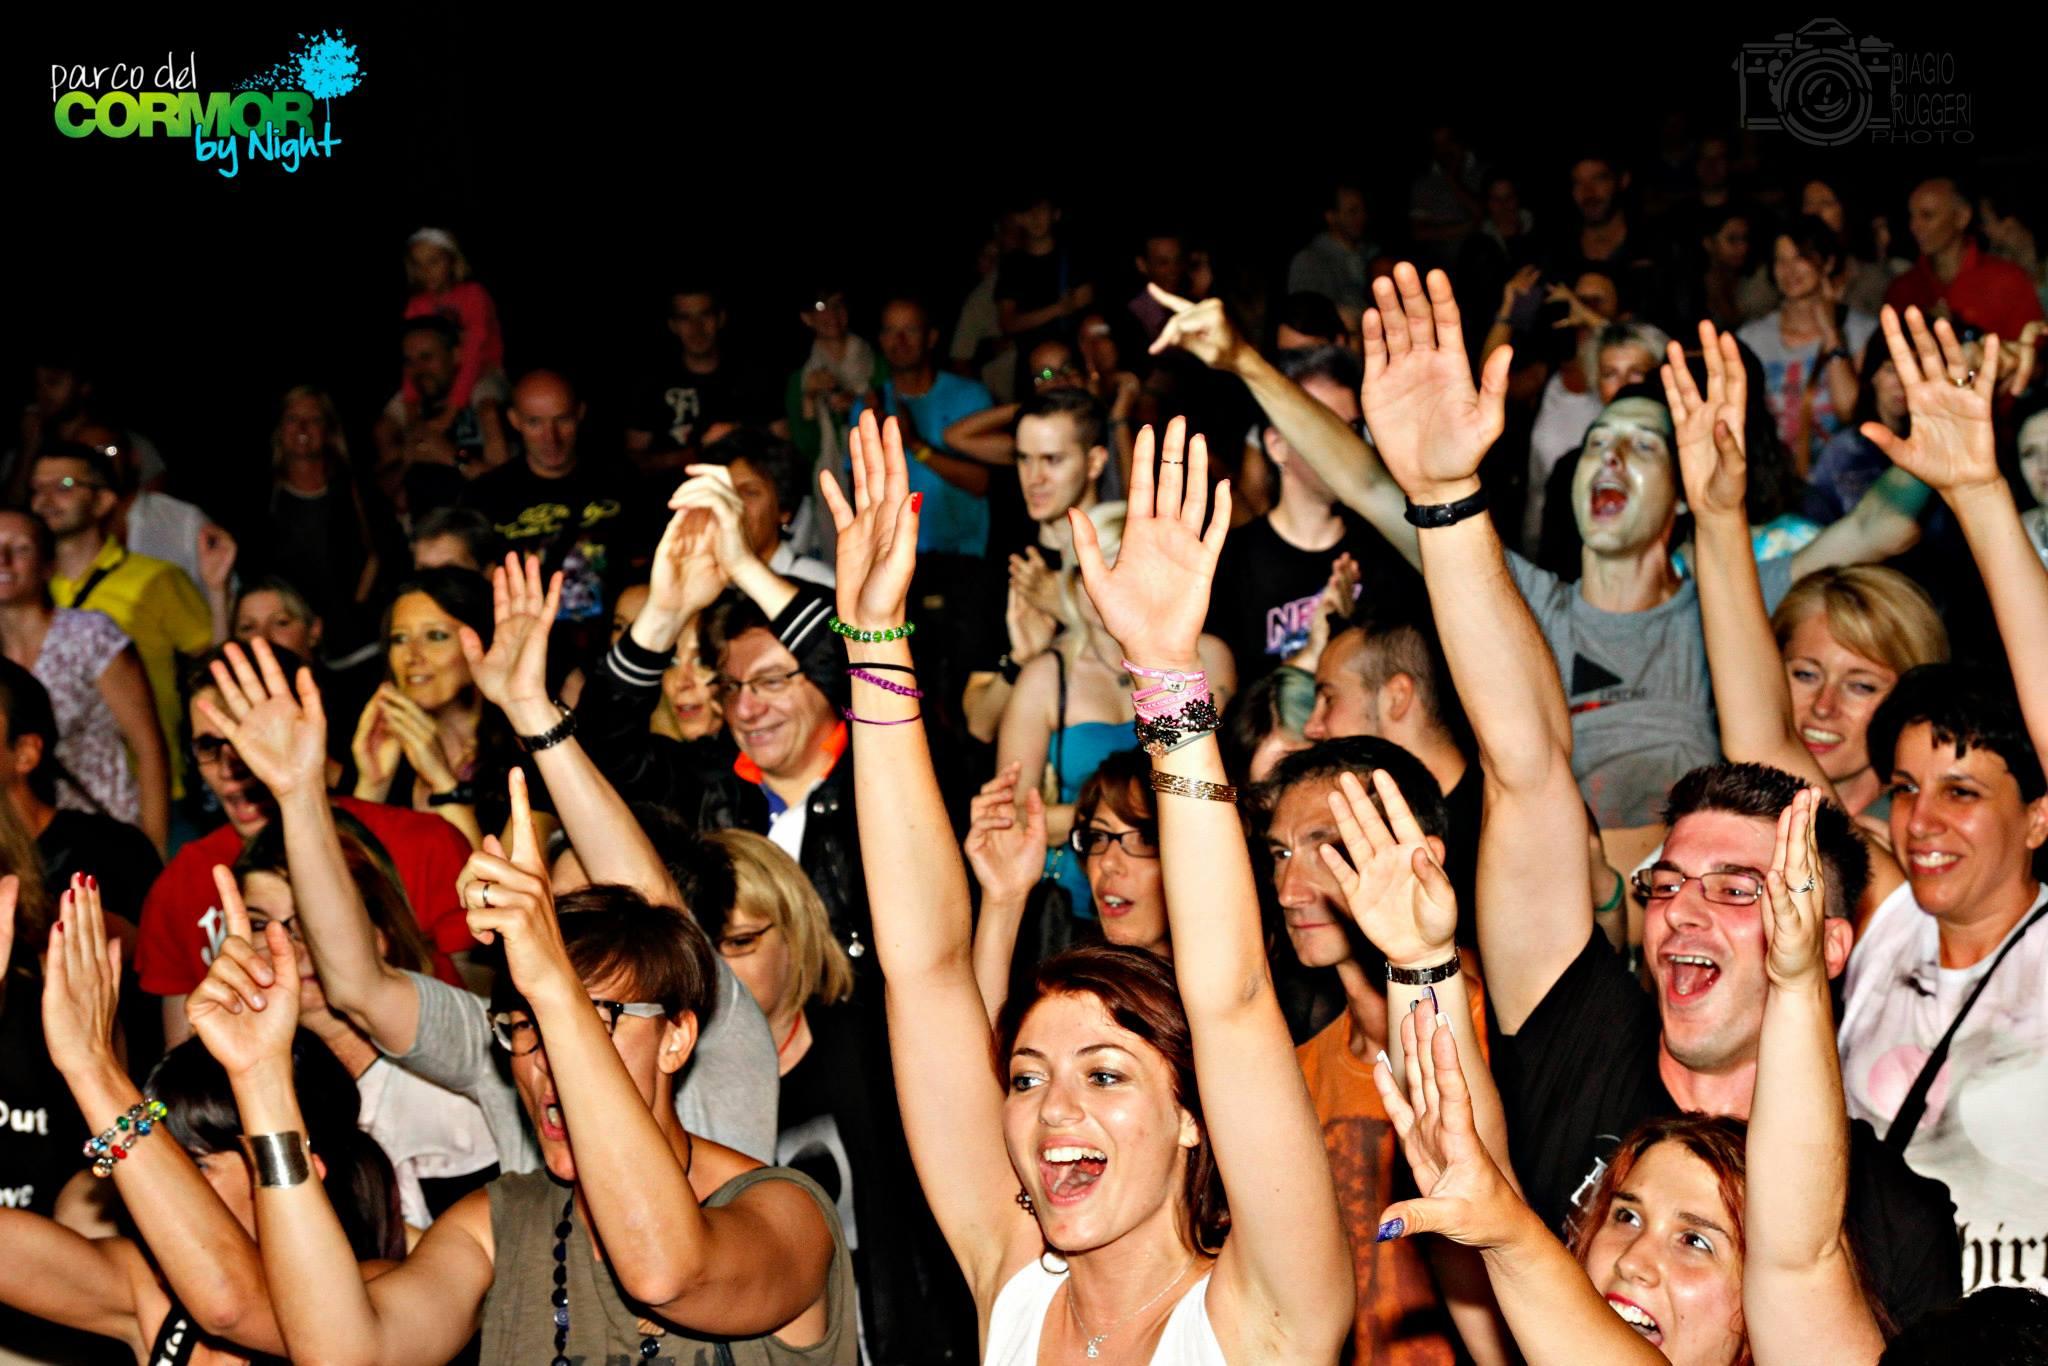 pubblico 10 24.07.2015   Women in Rock festival, concerto Living Dolls a Udine. Parco del Cormor.